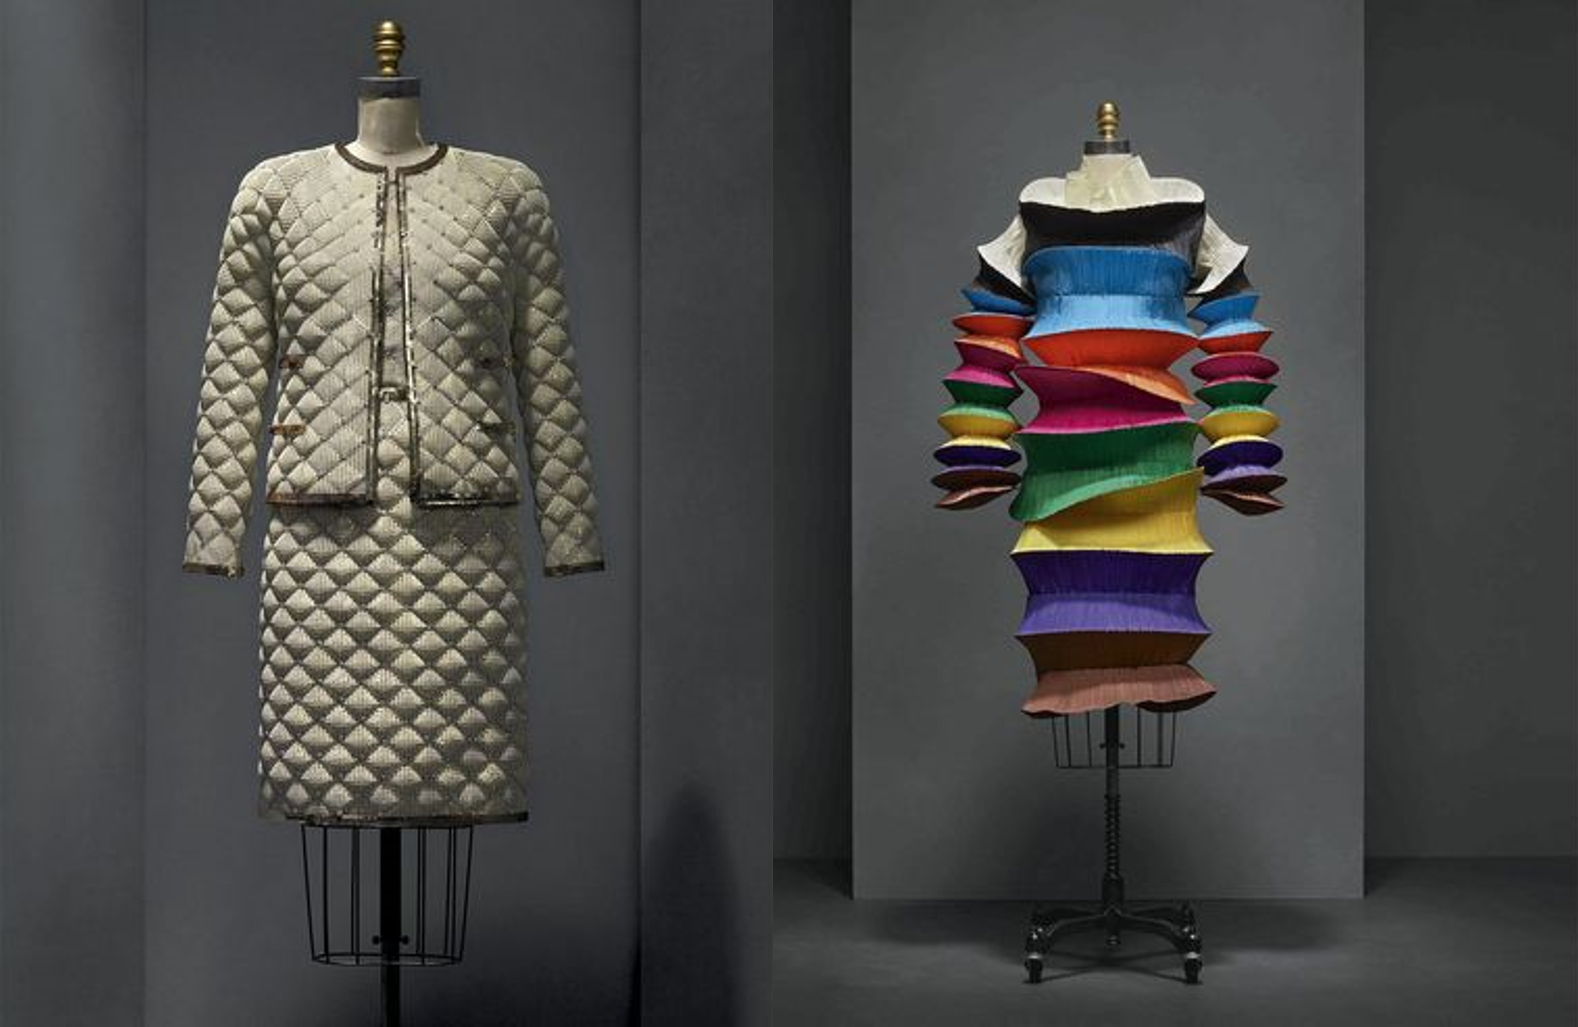 Zero Waste: Working Toward a Greener, More Mature Take on Fashion